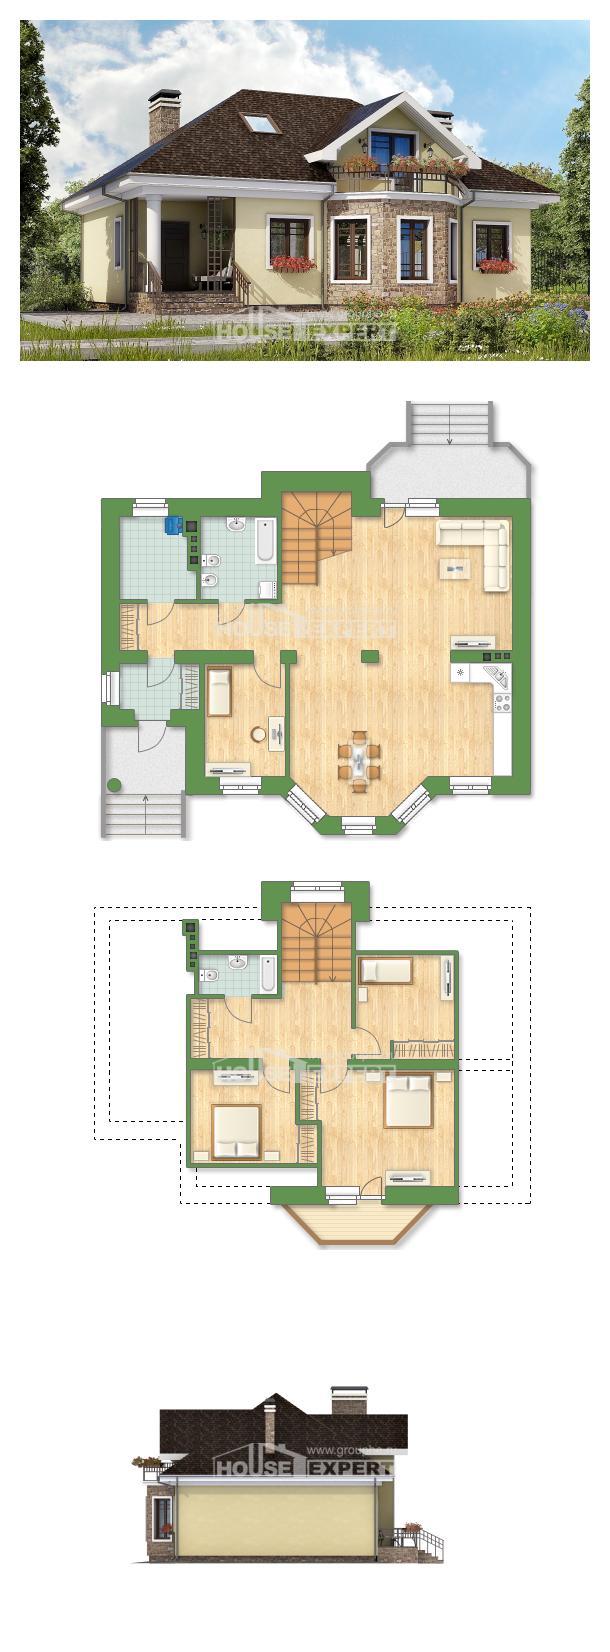 Проект дома 150-008-Л   House Expert